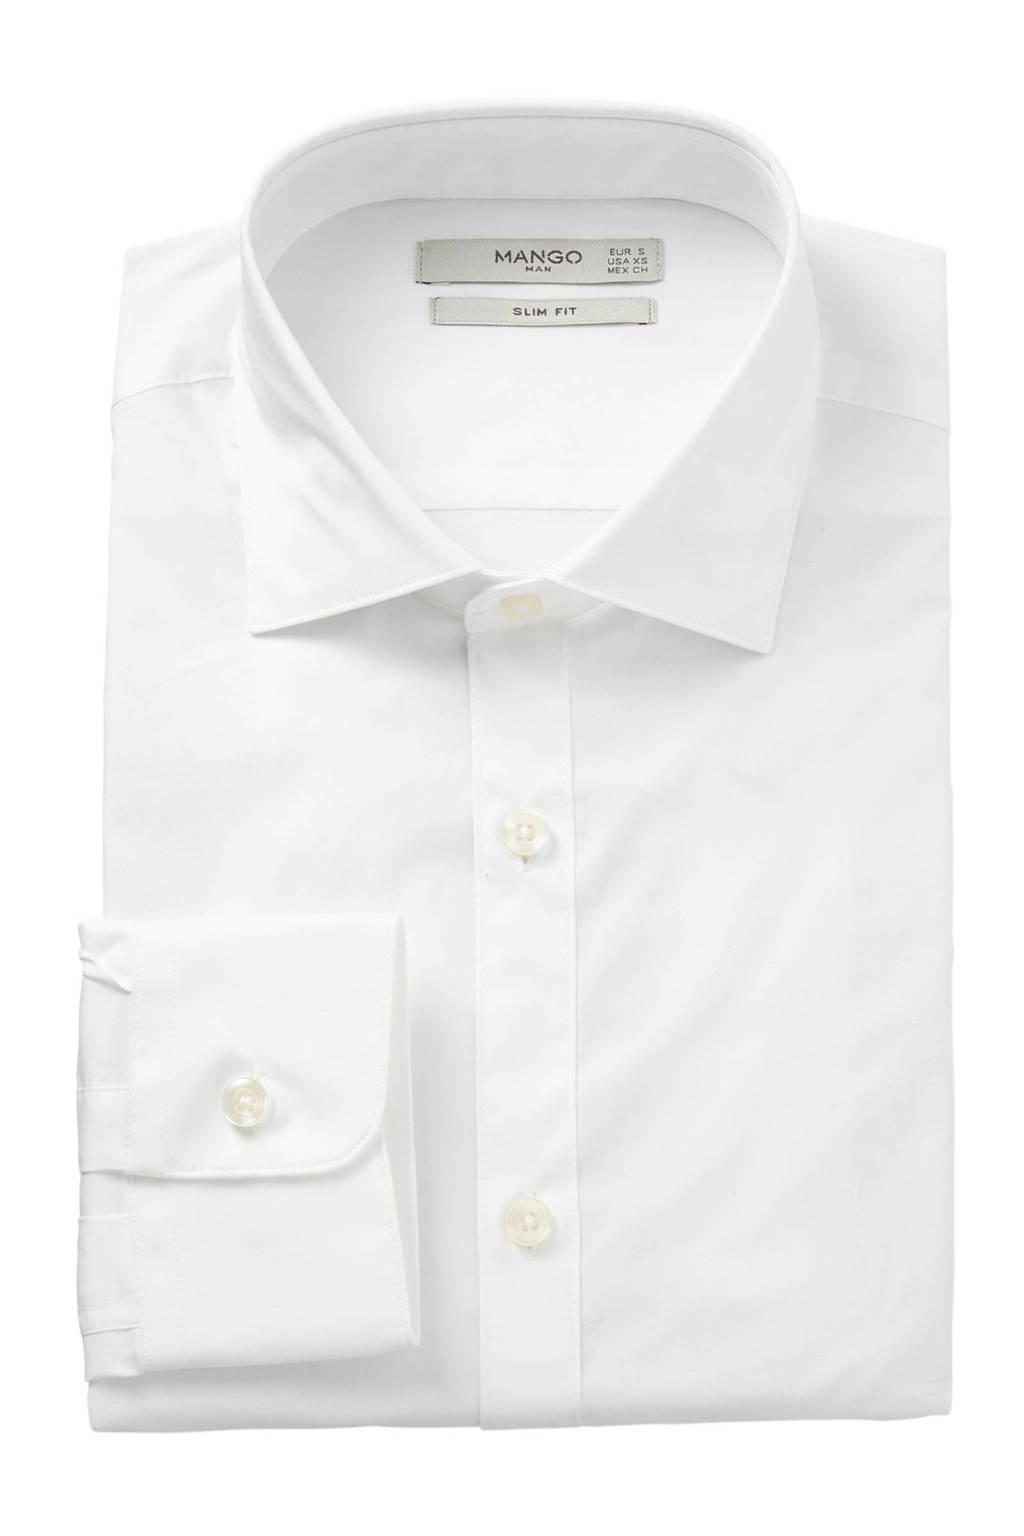 Overhemd Wit Slim Fit.Mango Man Slim Fit Overhemd Wit Wehkamp